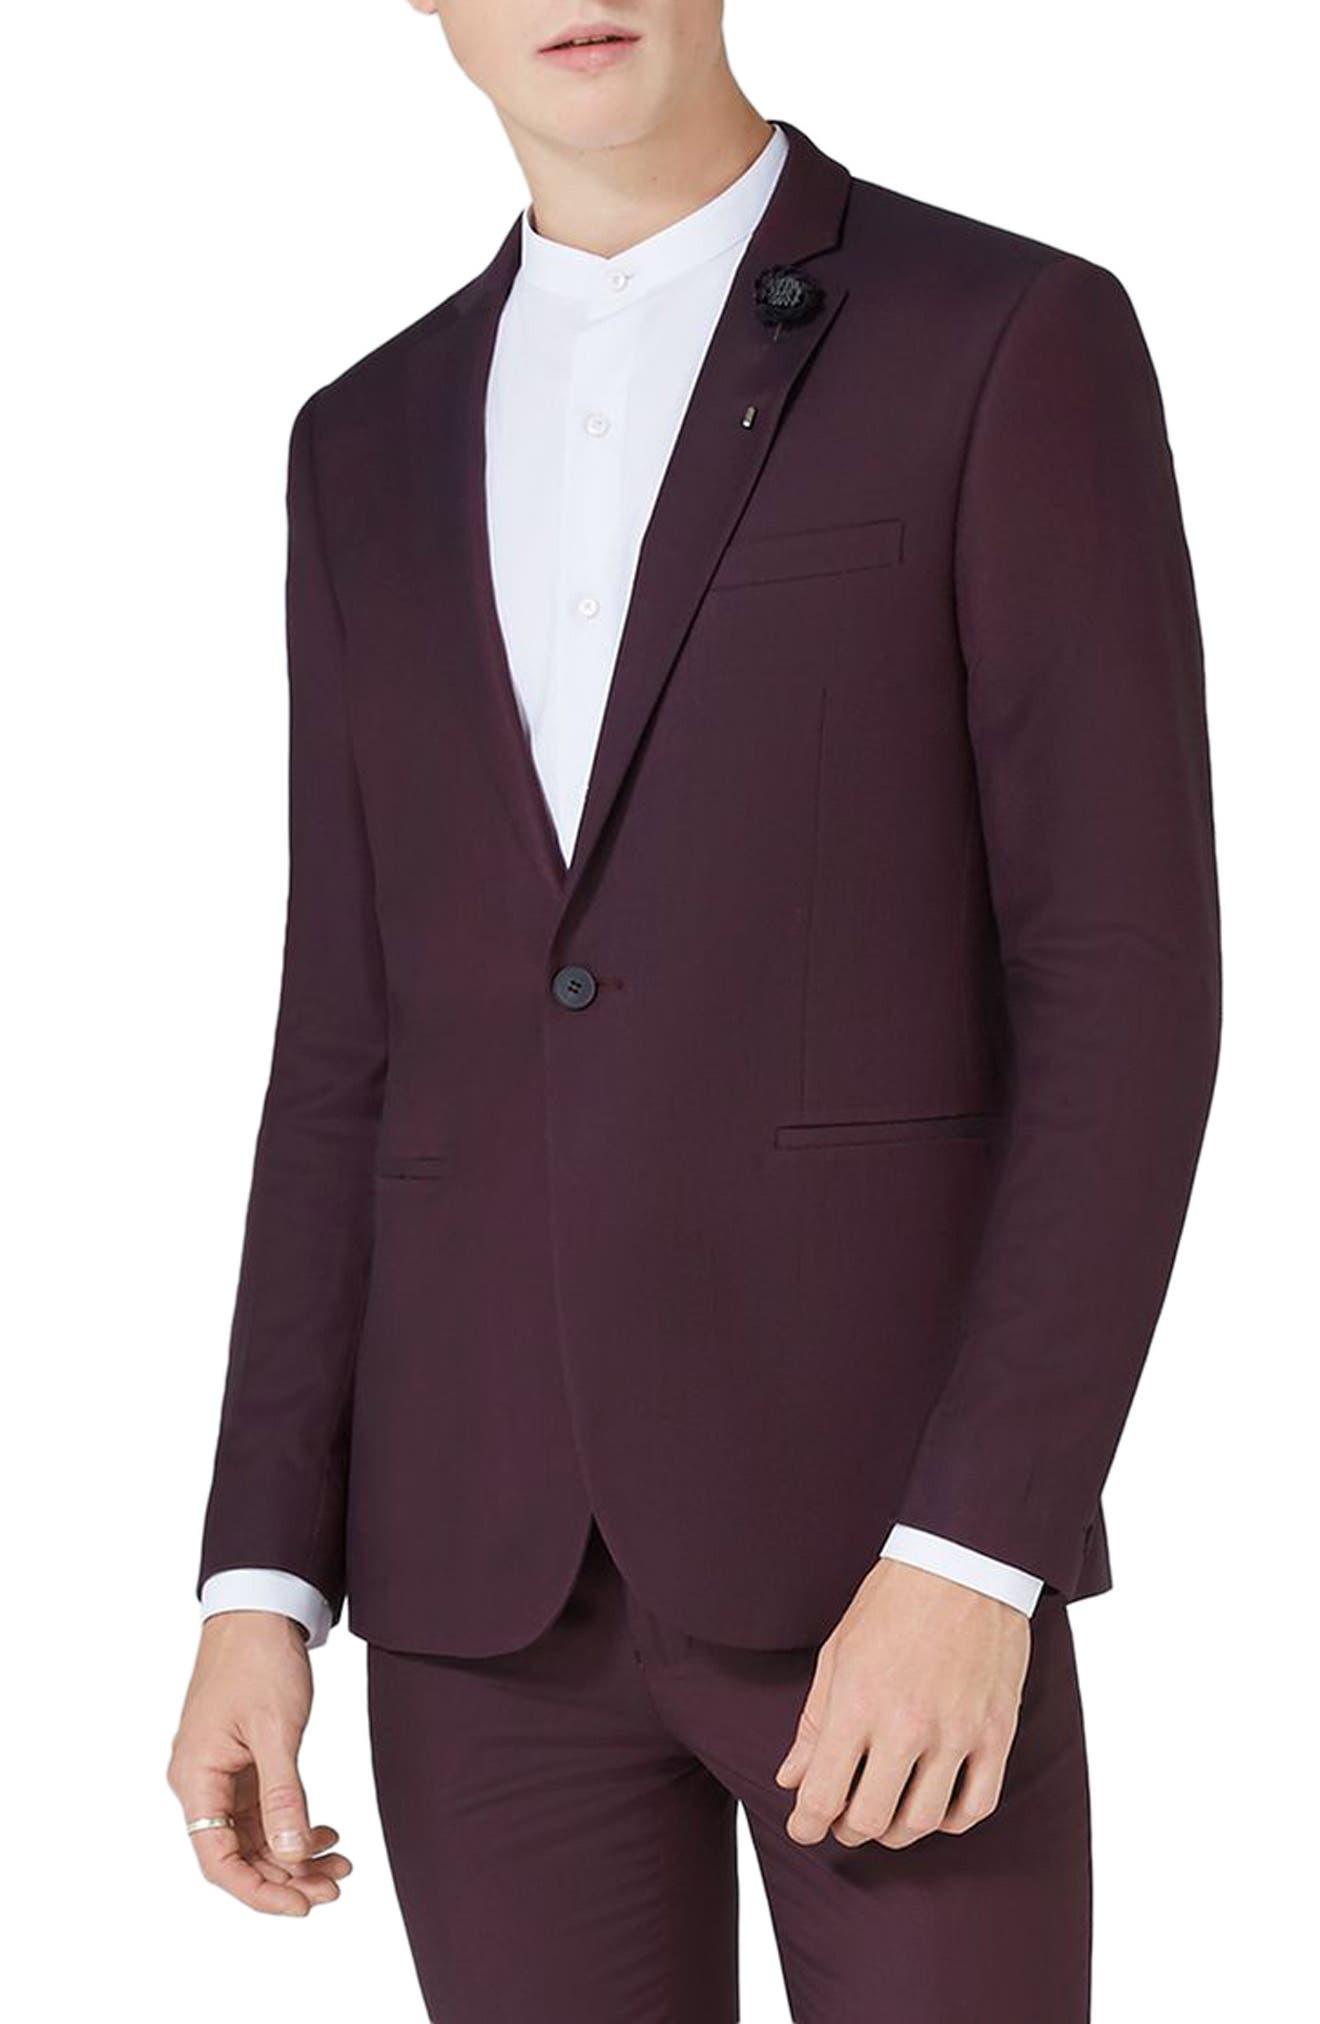 Main Image - Topman Skinny Fit Plum One-Button Suit Jacket